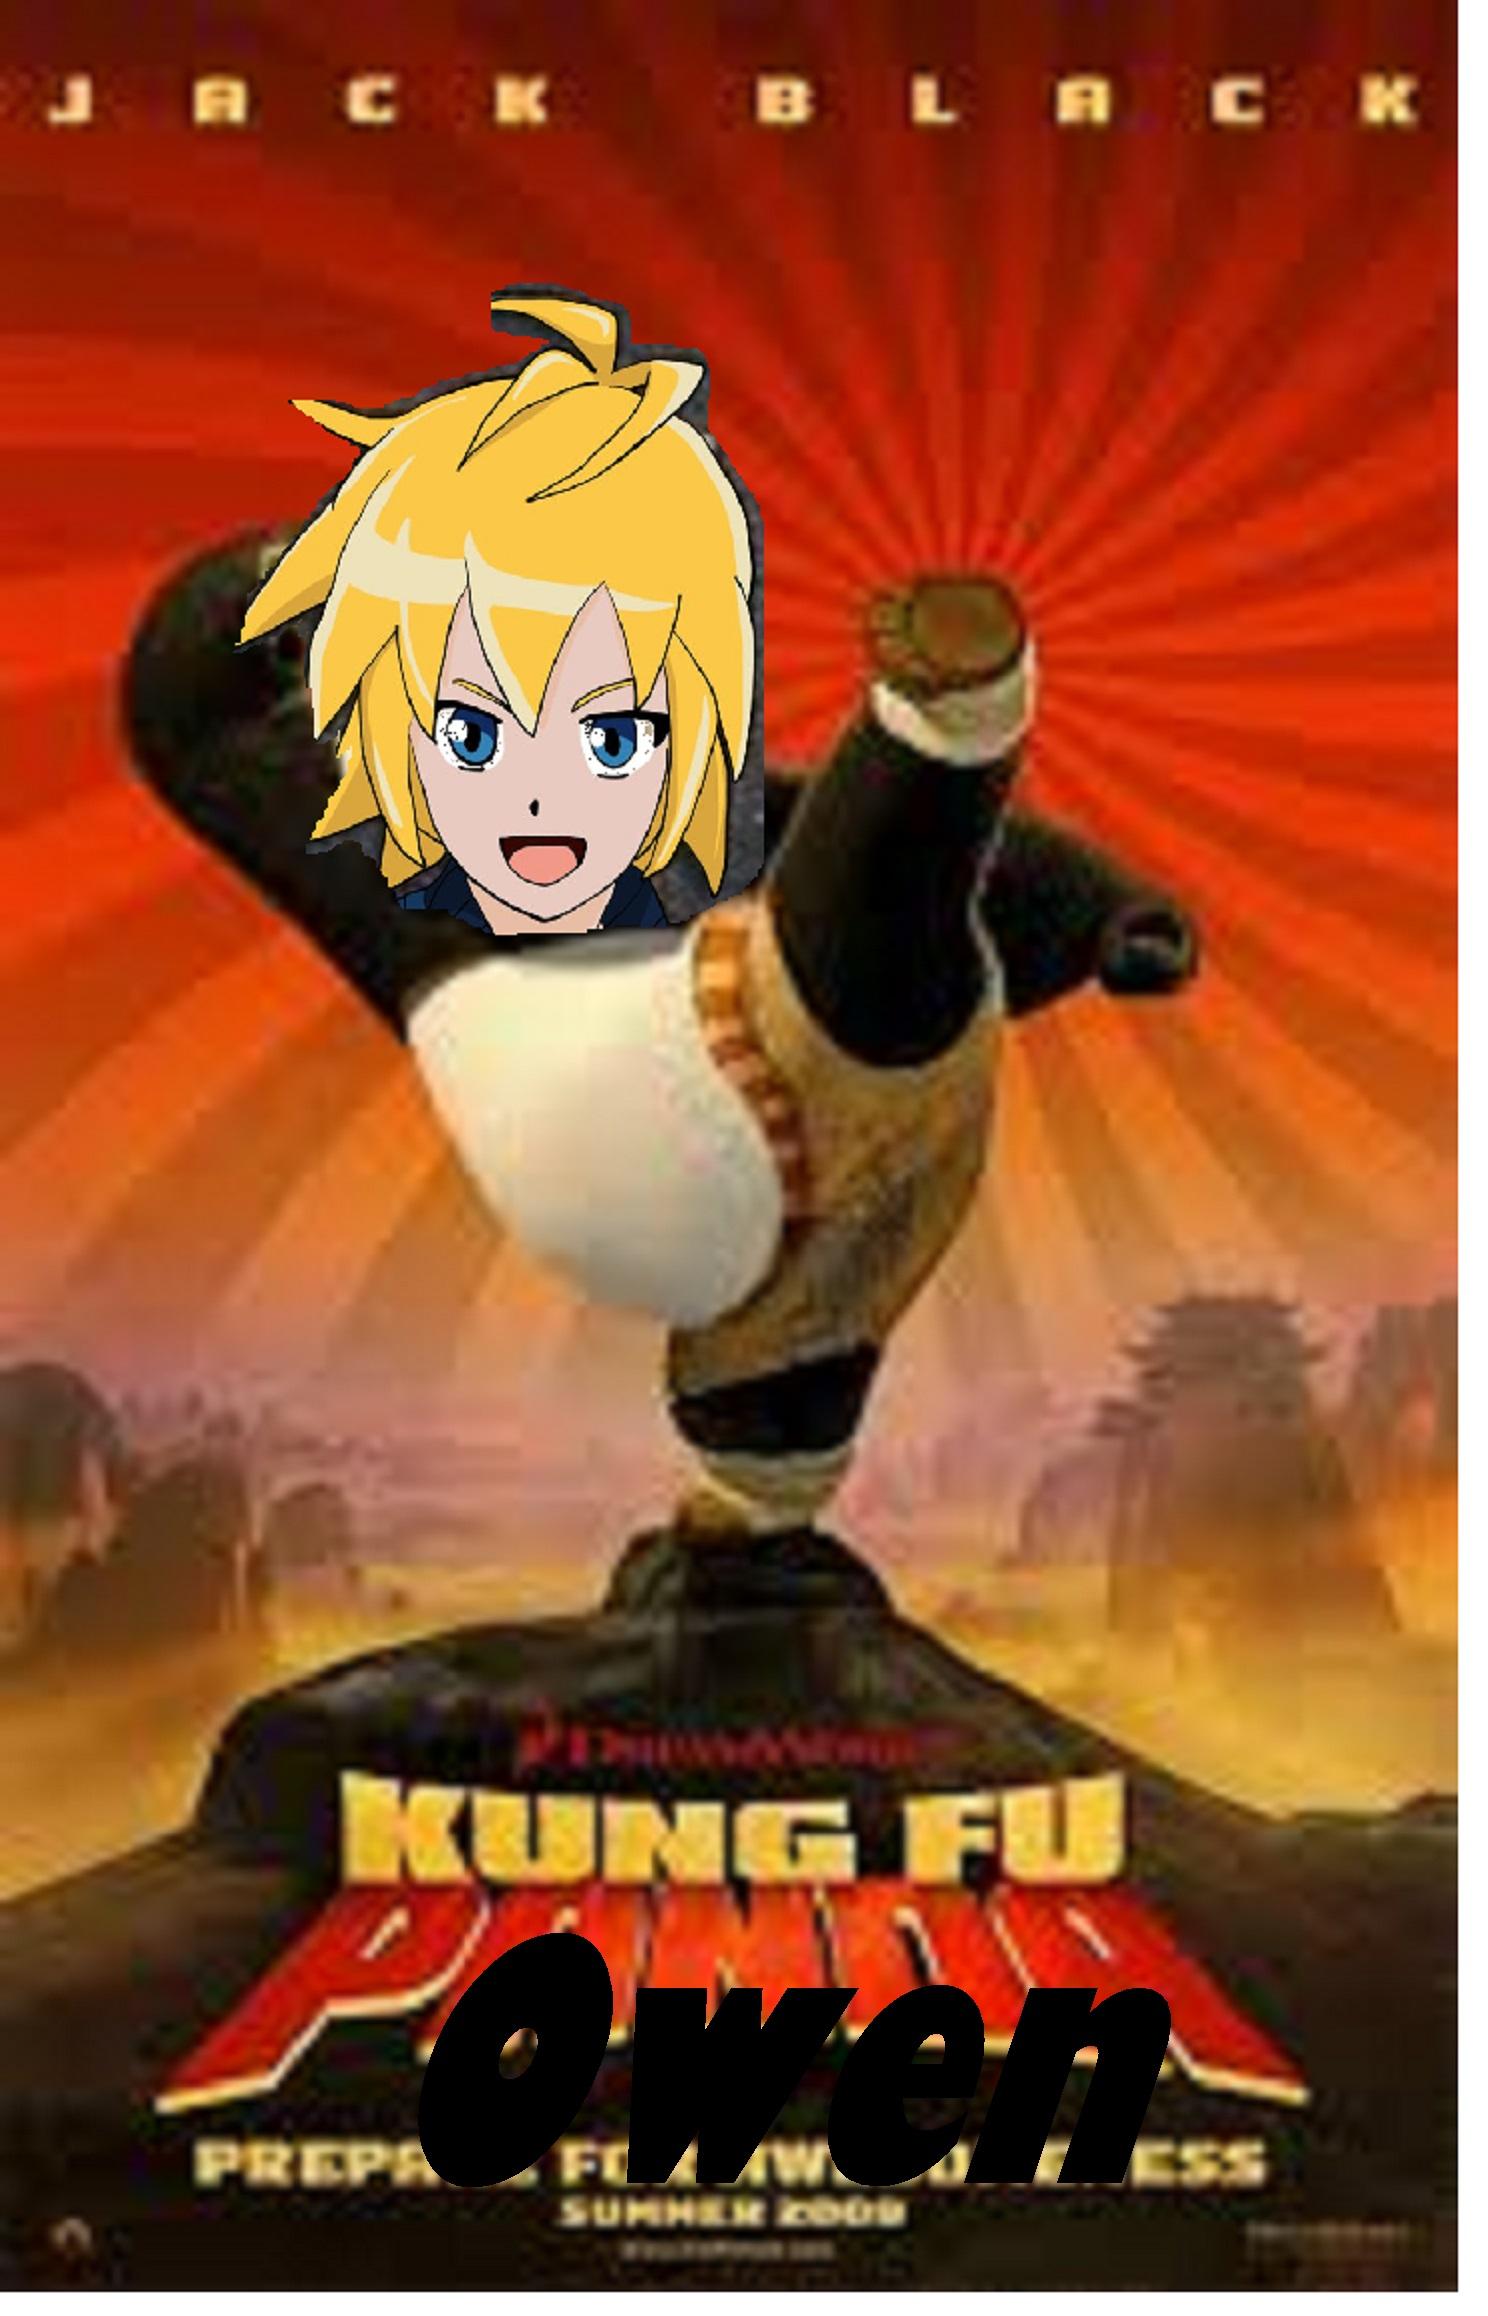 Kung Fu Owen (DinosaurKingRockz Style)